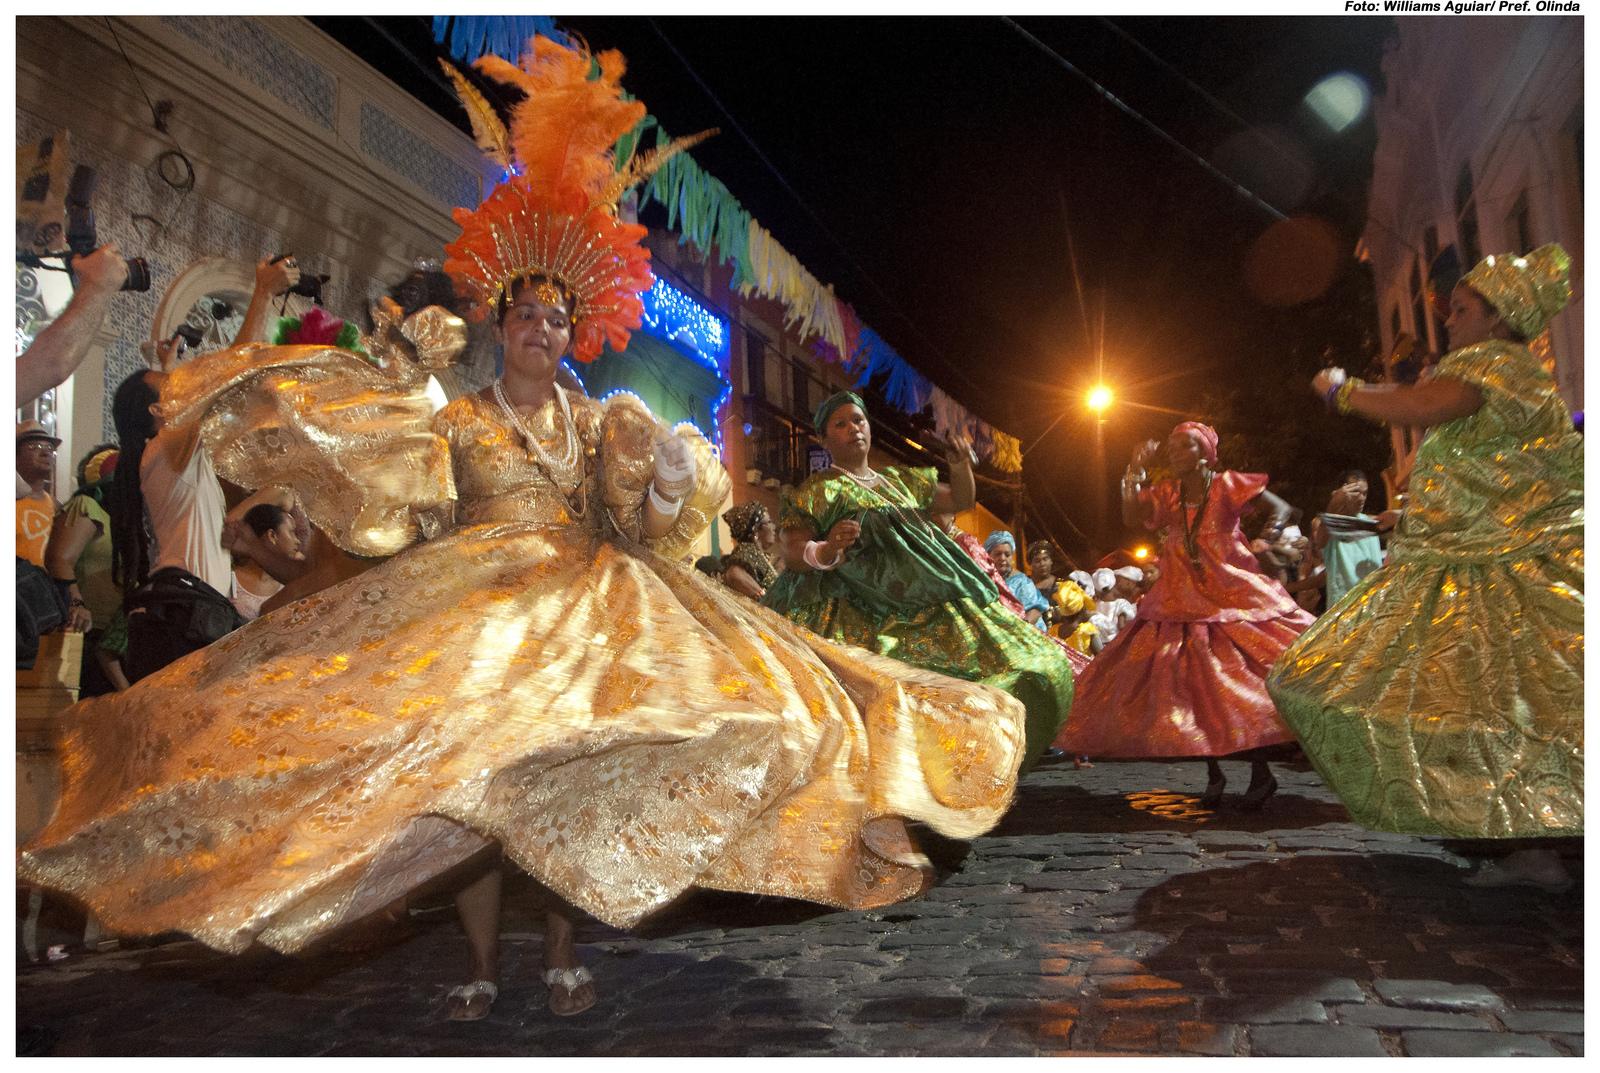 Dia Estadual do Maracatu. Foto: Williams Aguiar/Pref.Olinda